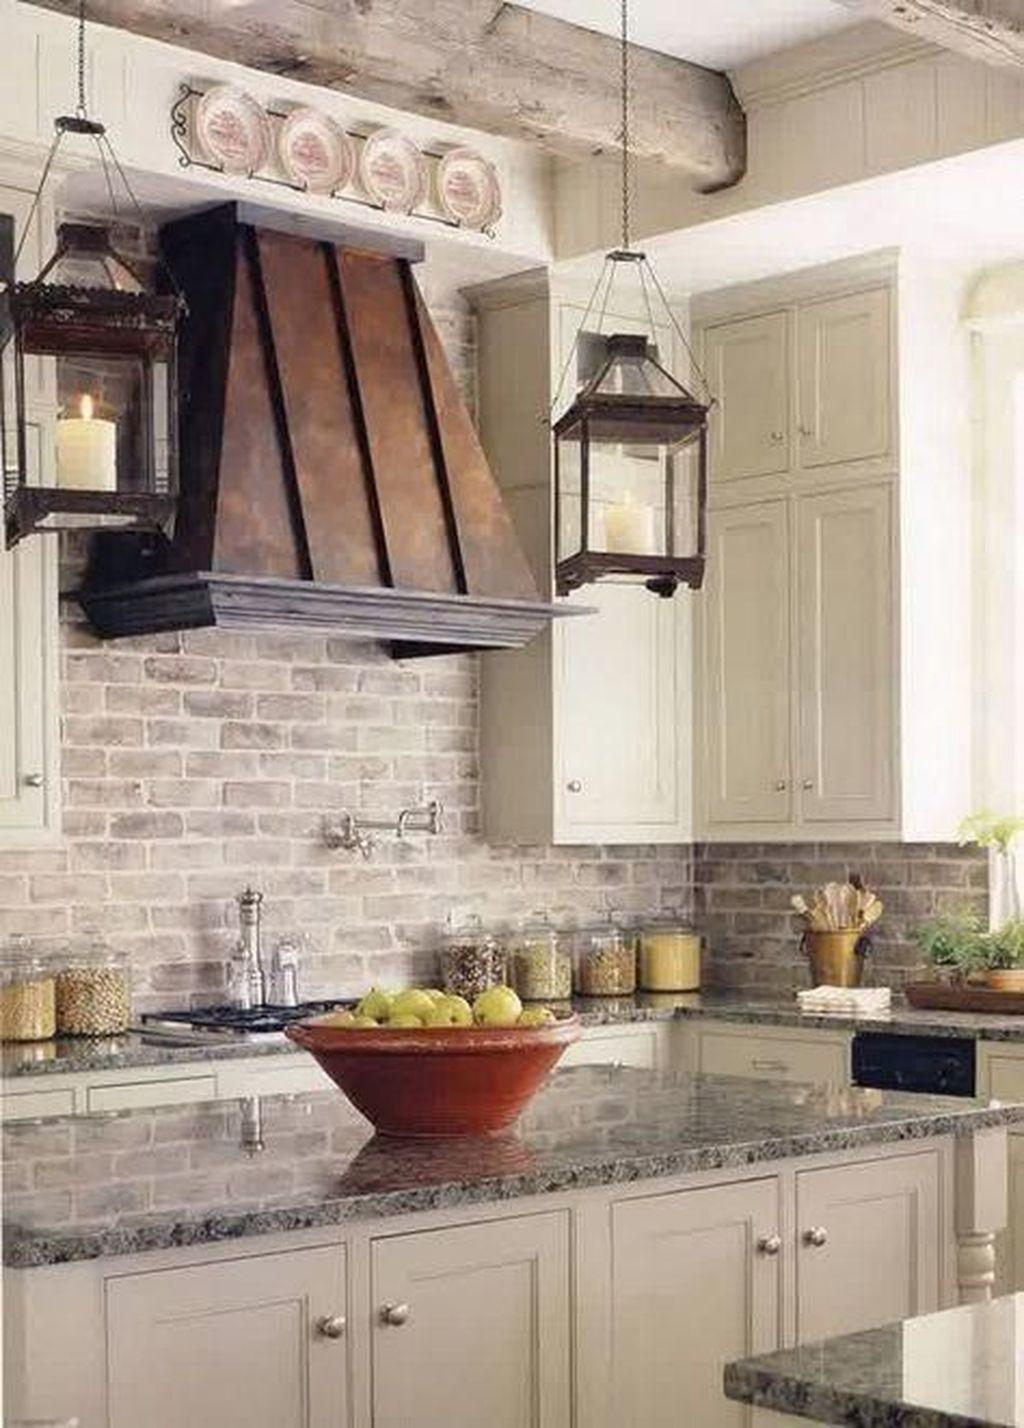 31 Popular Kitchen Backsplash Design Ideas Will Be Trend 2020 In 2020 Rustic Kitchen Backsplash Farmhouse Kitchen Backsplash Brick Kitchen